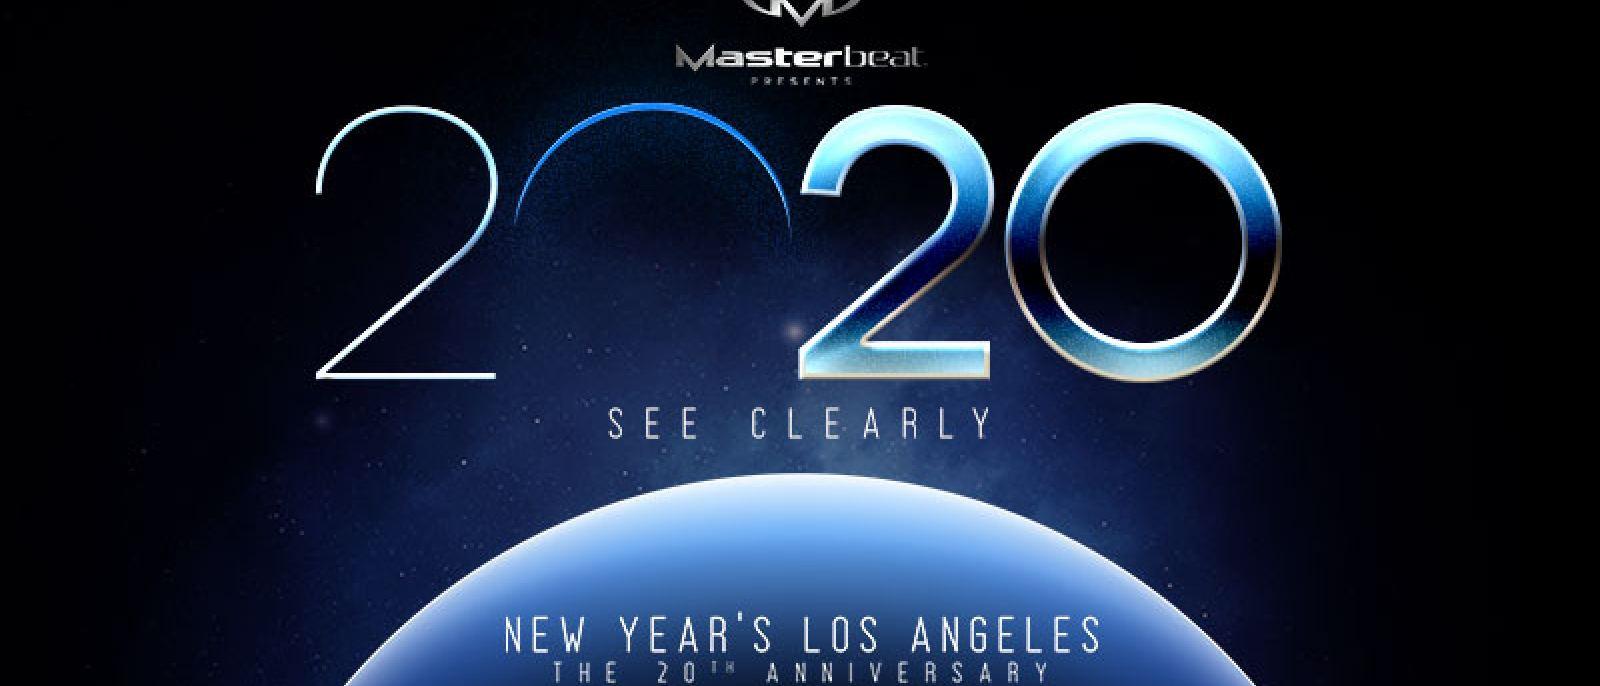 Masterbeat 2020 NYE Los Angeles